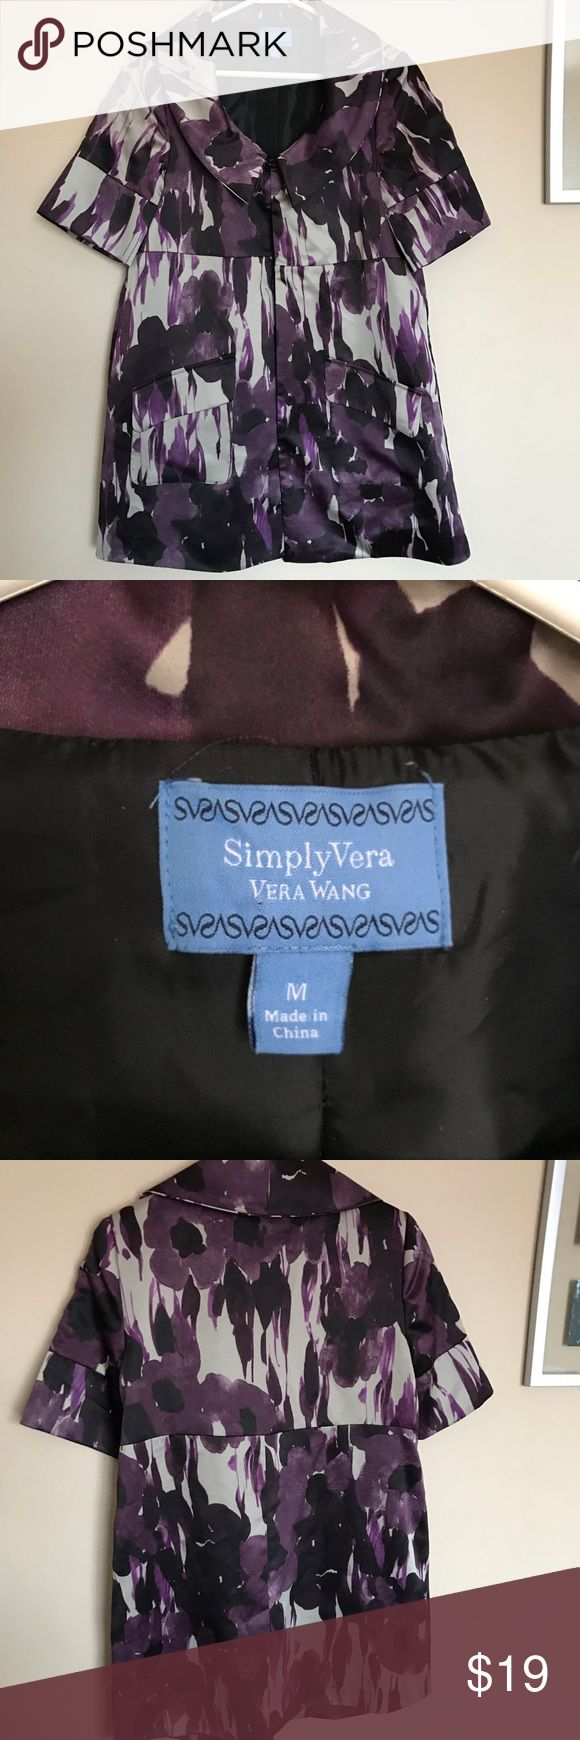 Simply Vera Vera Wang polyester floral overcoat Simply Vera Vera Wang Overcoat Coat Blazer Size: Medium Dark Purple Women's Jackets & Outerwear. Practically New. 100% Polyester Simply Vera Vera Wang Jackets & Coats